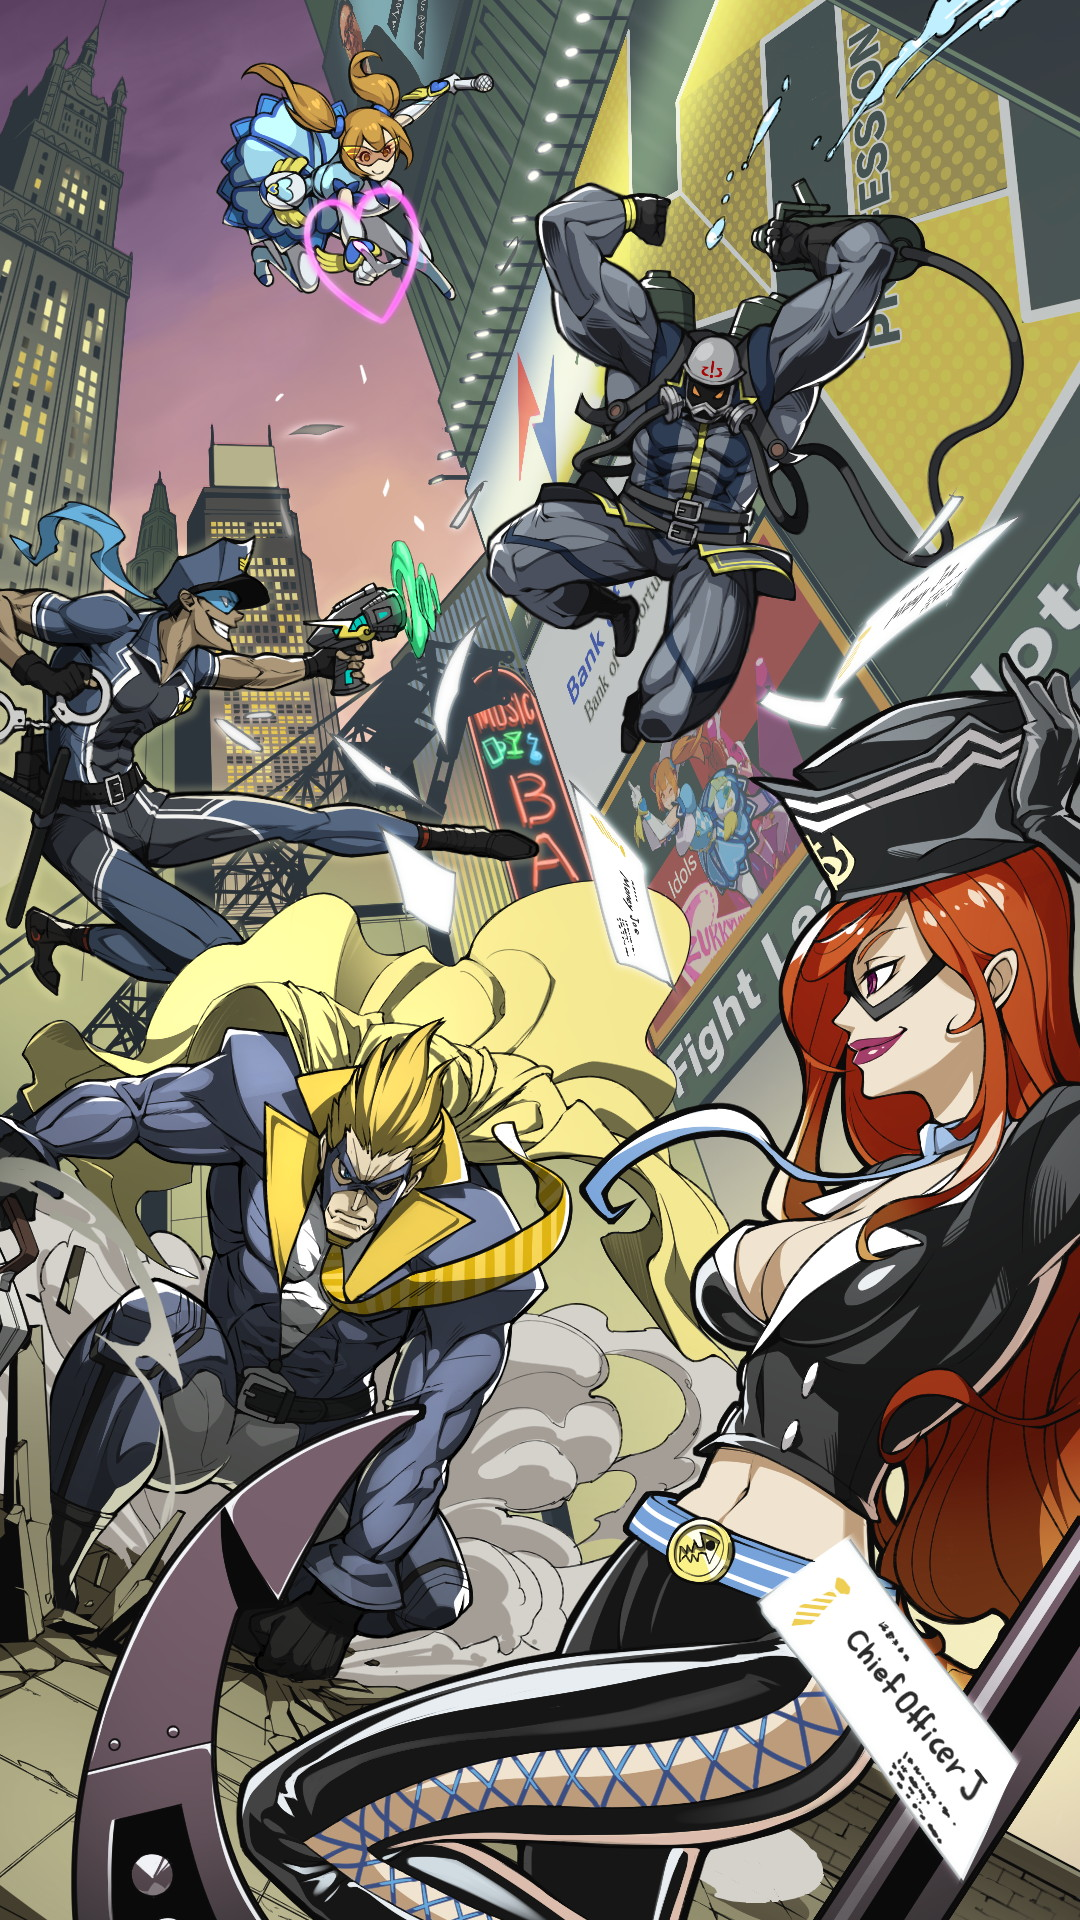 XFLAGの新作『ファイトリーグ』が本日リリース! タッグを組んで戦うバトルエンターテインメント